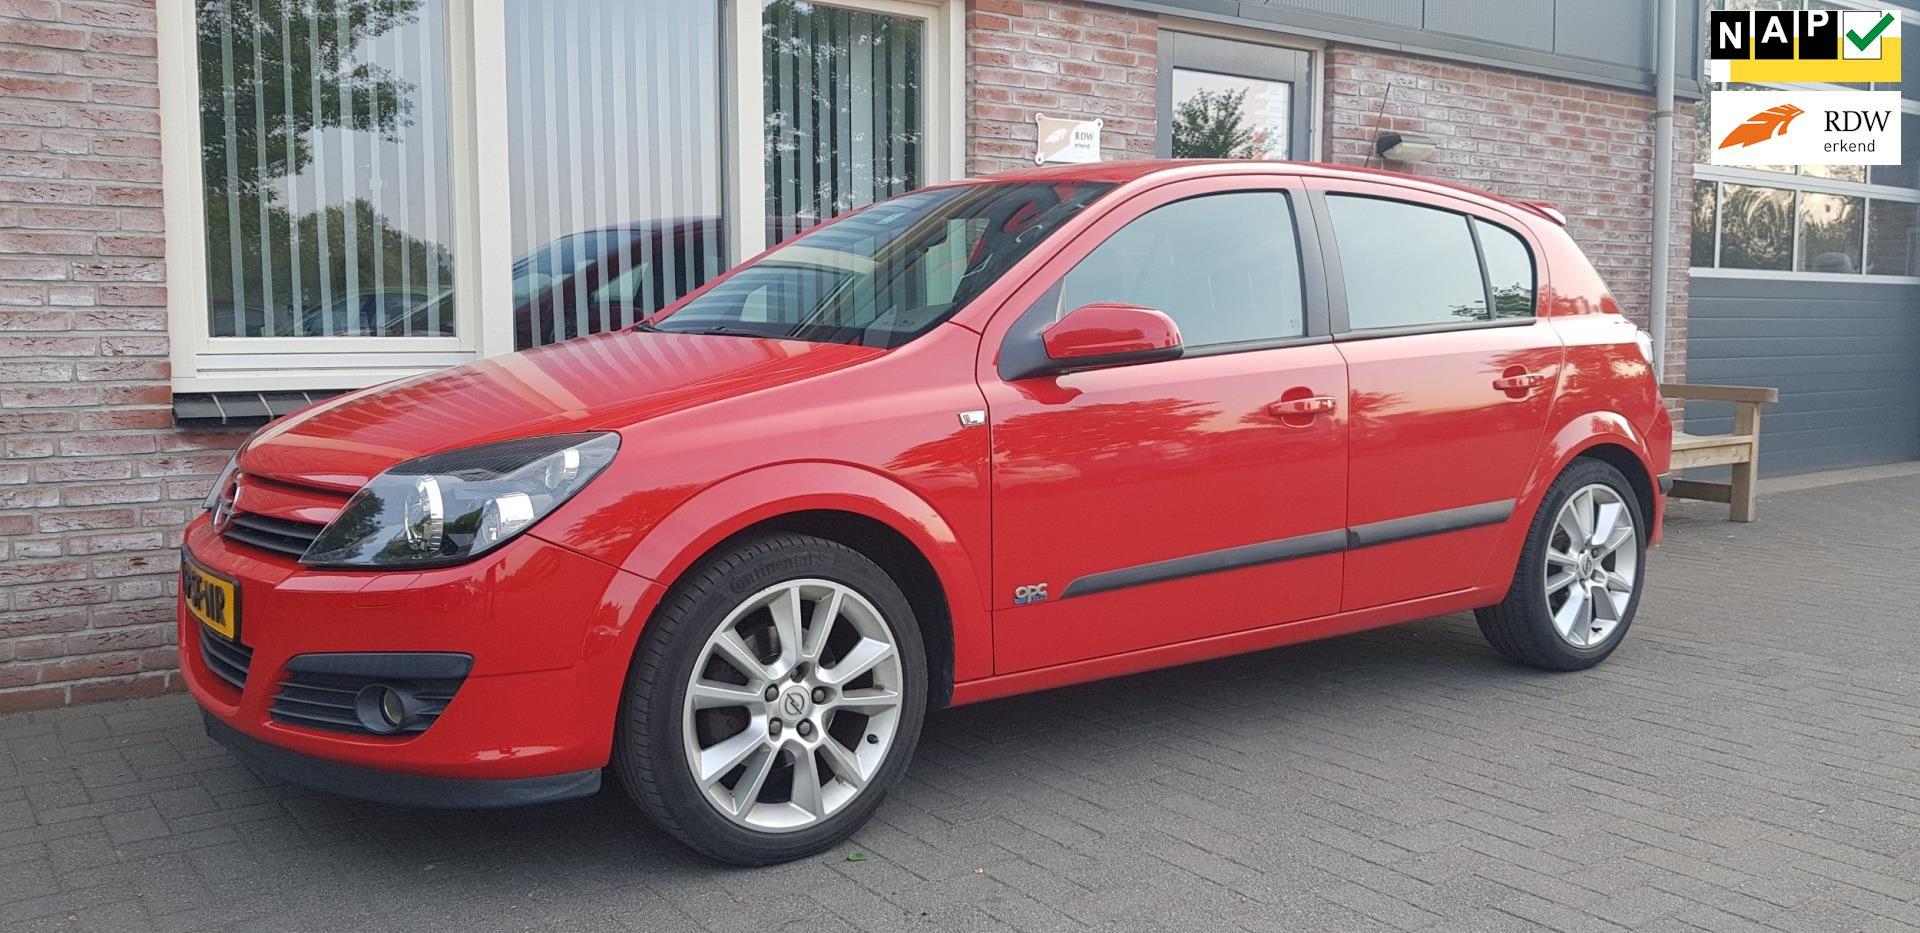 Opel Astra occasion - Autobedrijf Achterberg